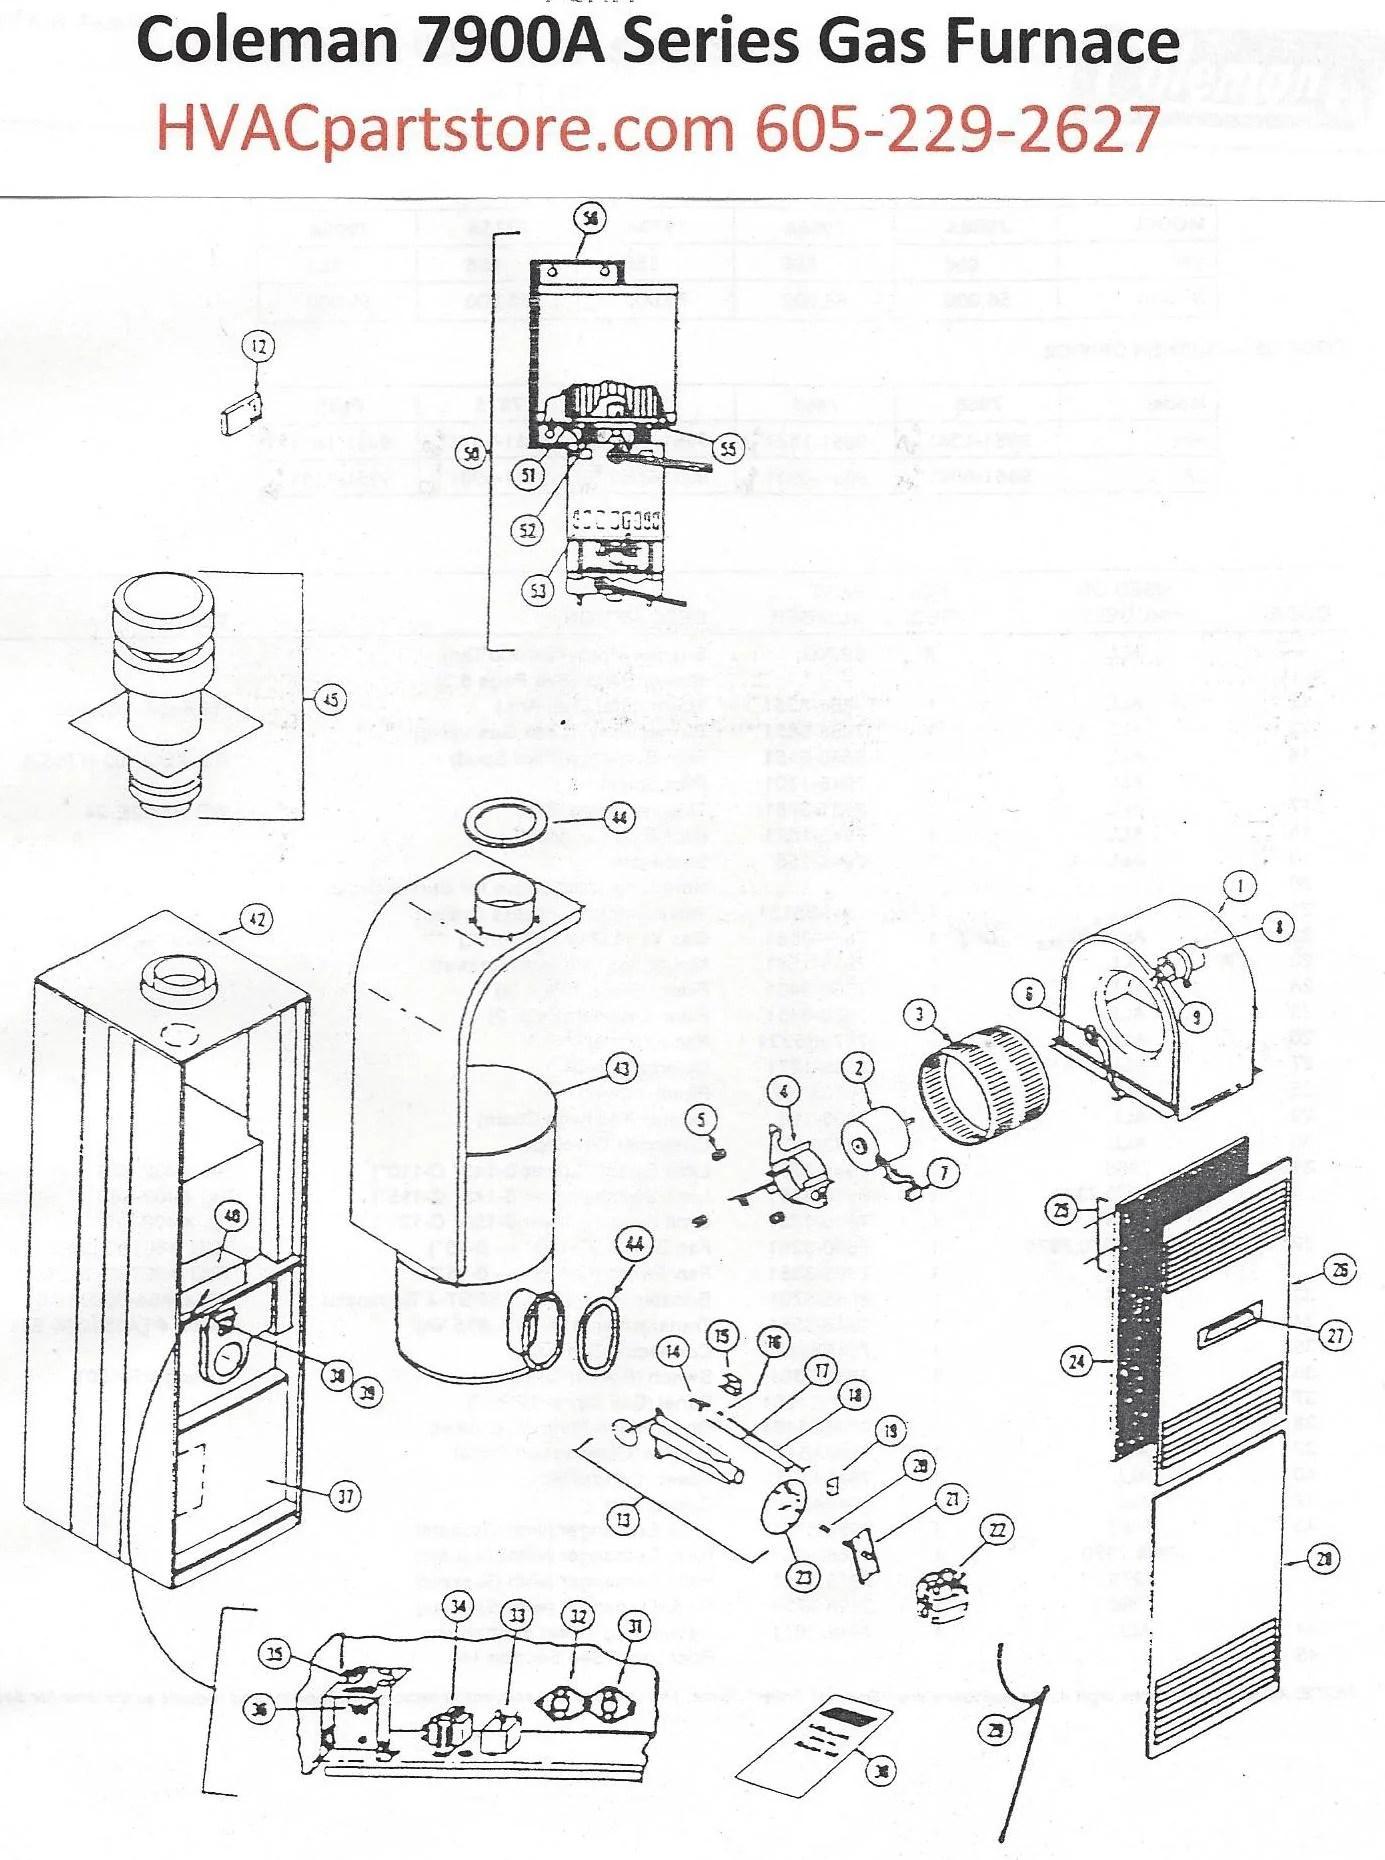 medium resolution of 7975a856 coleman gas furnace parts u2013 hvacpartstore coleman heater wiring diagram eb17b coleman electric